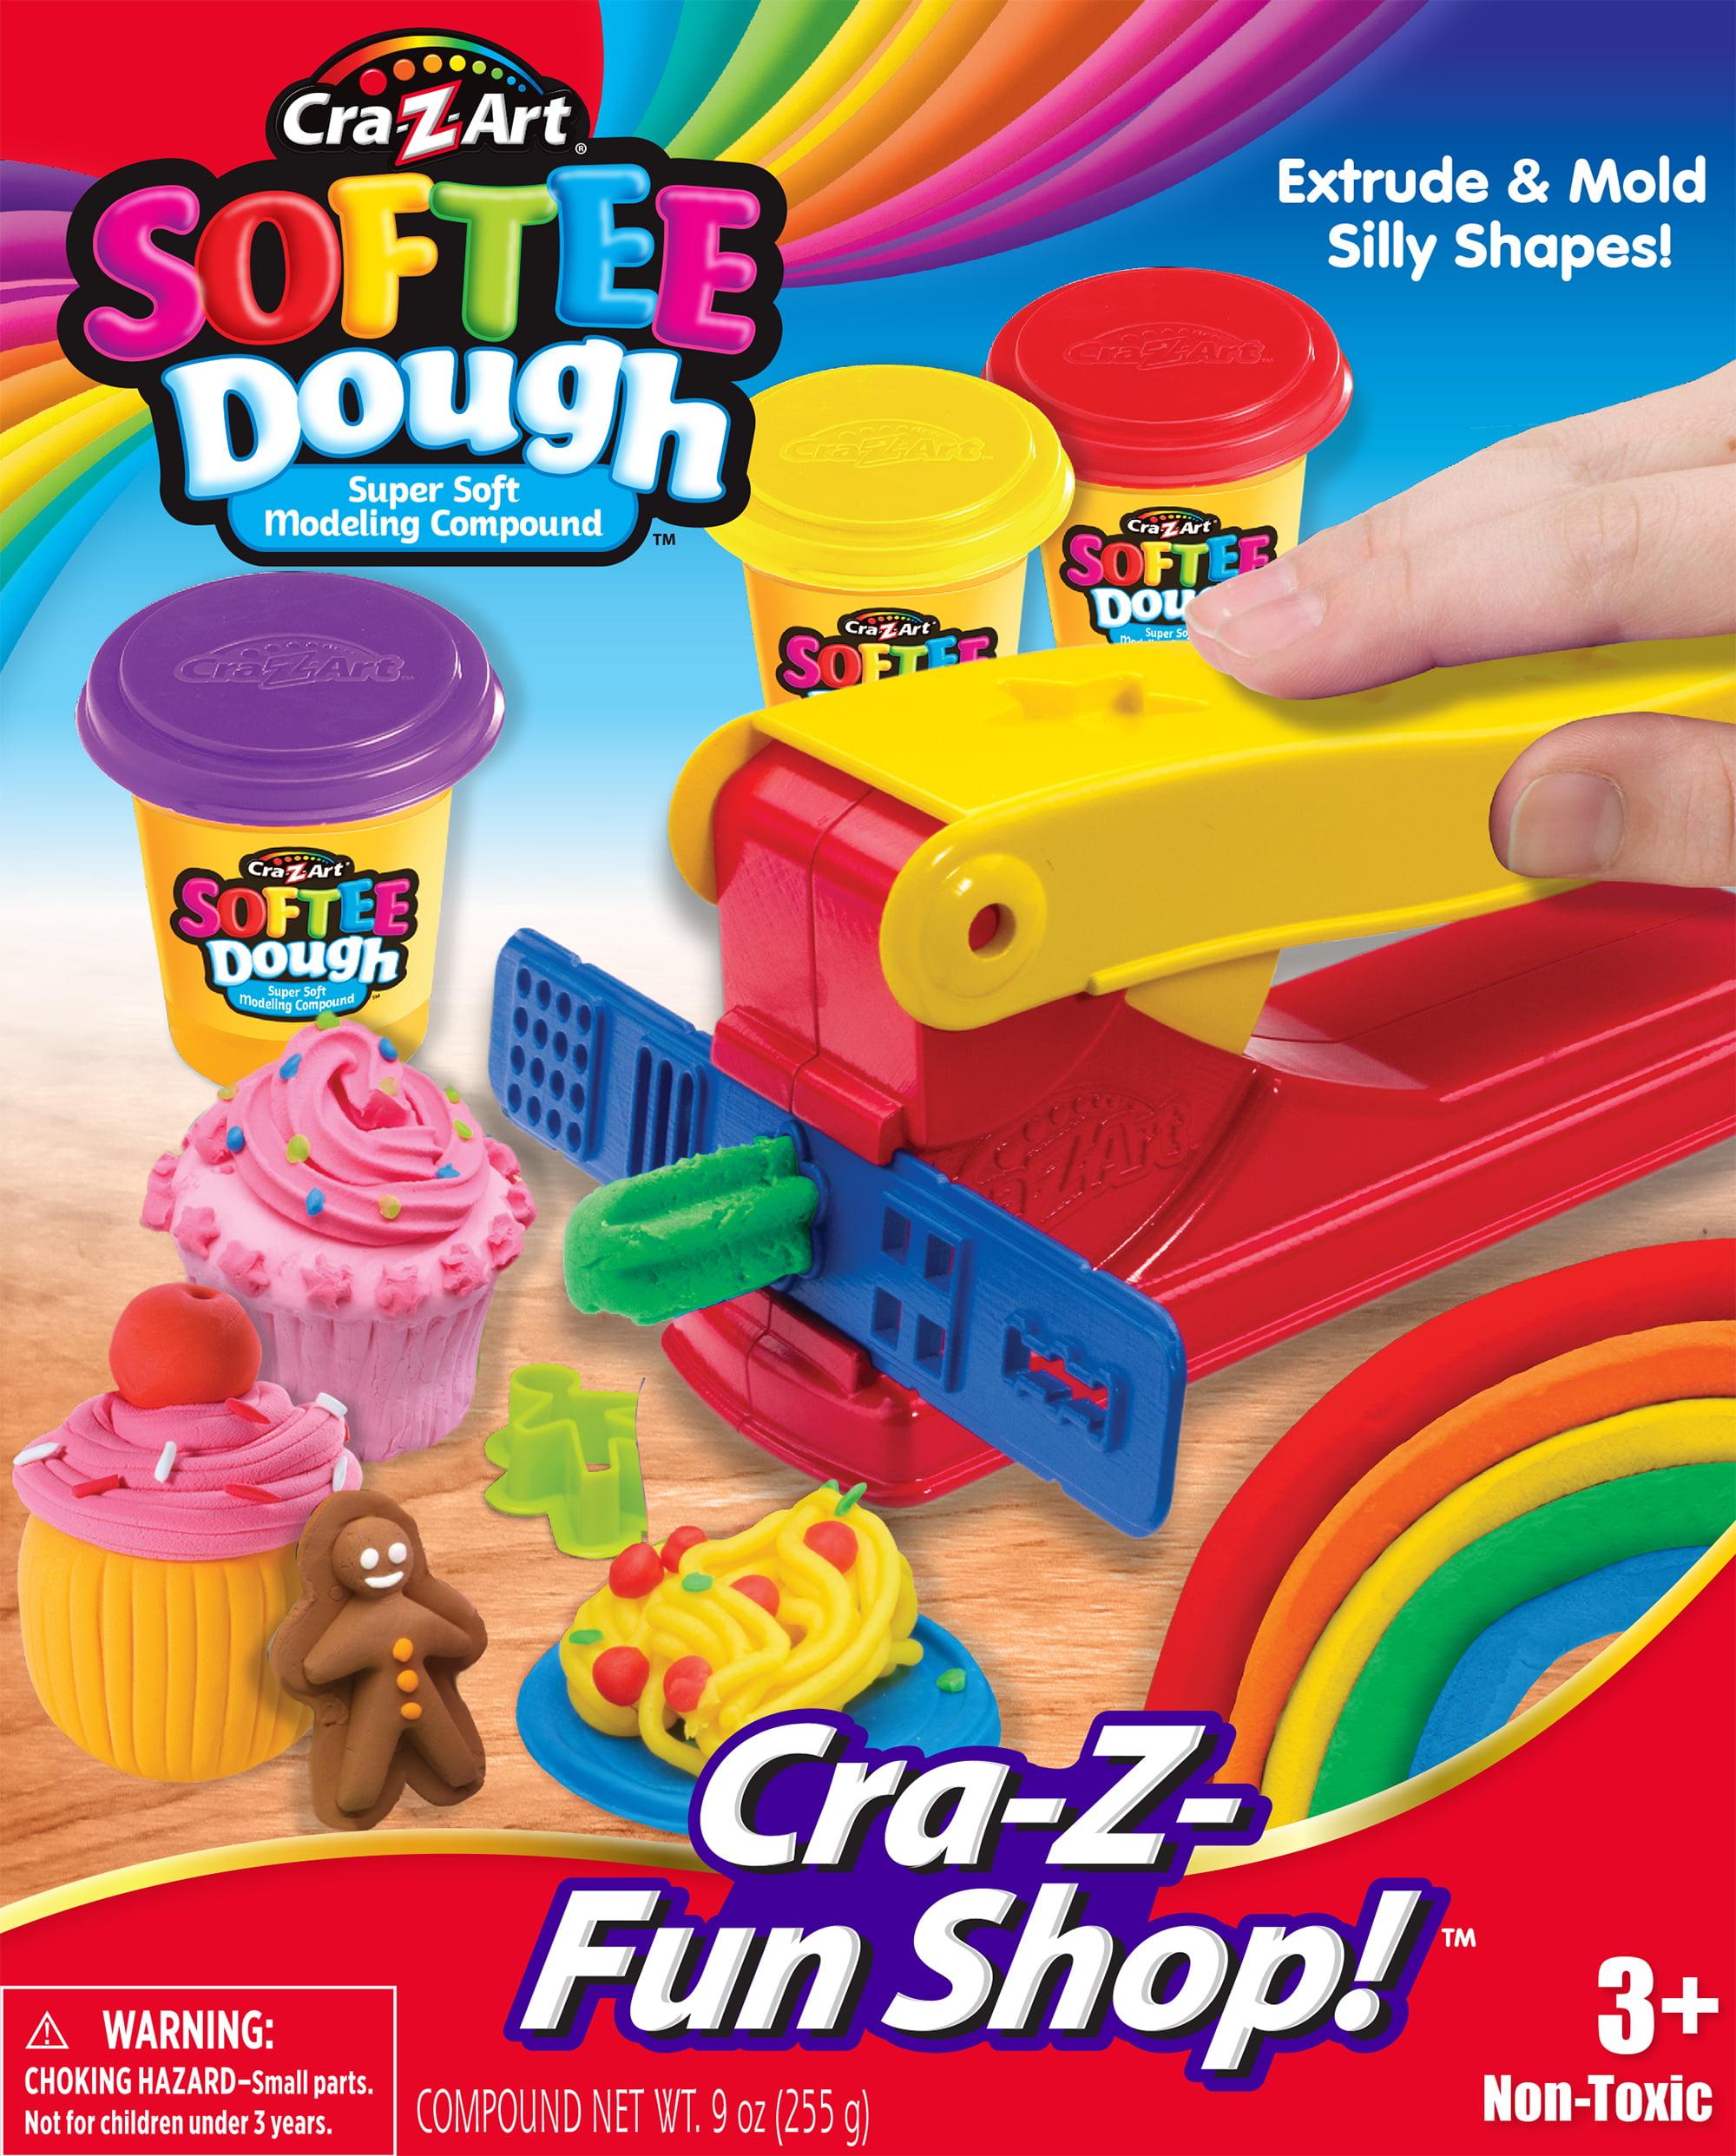 Cra-Z-Art Fun Factory by CraZart